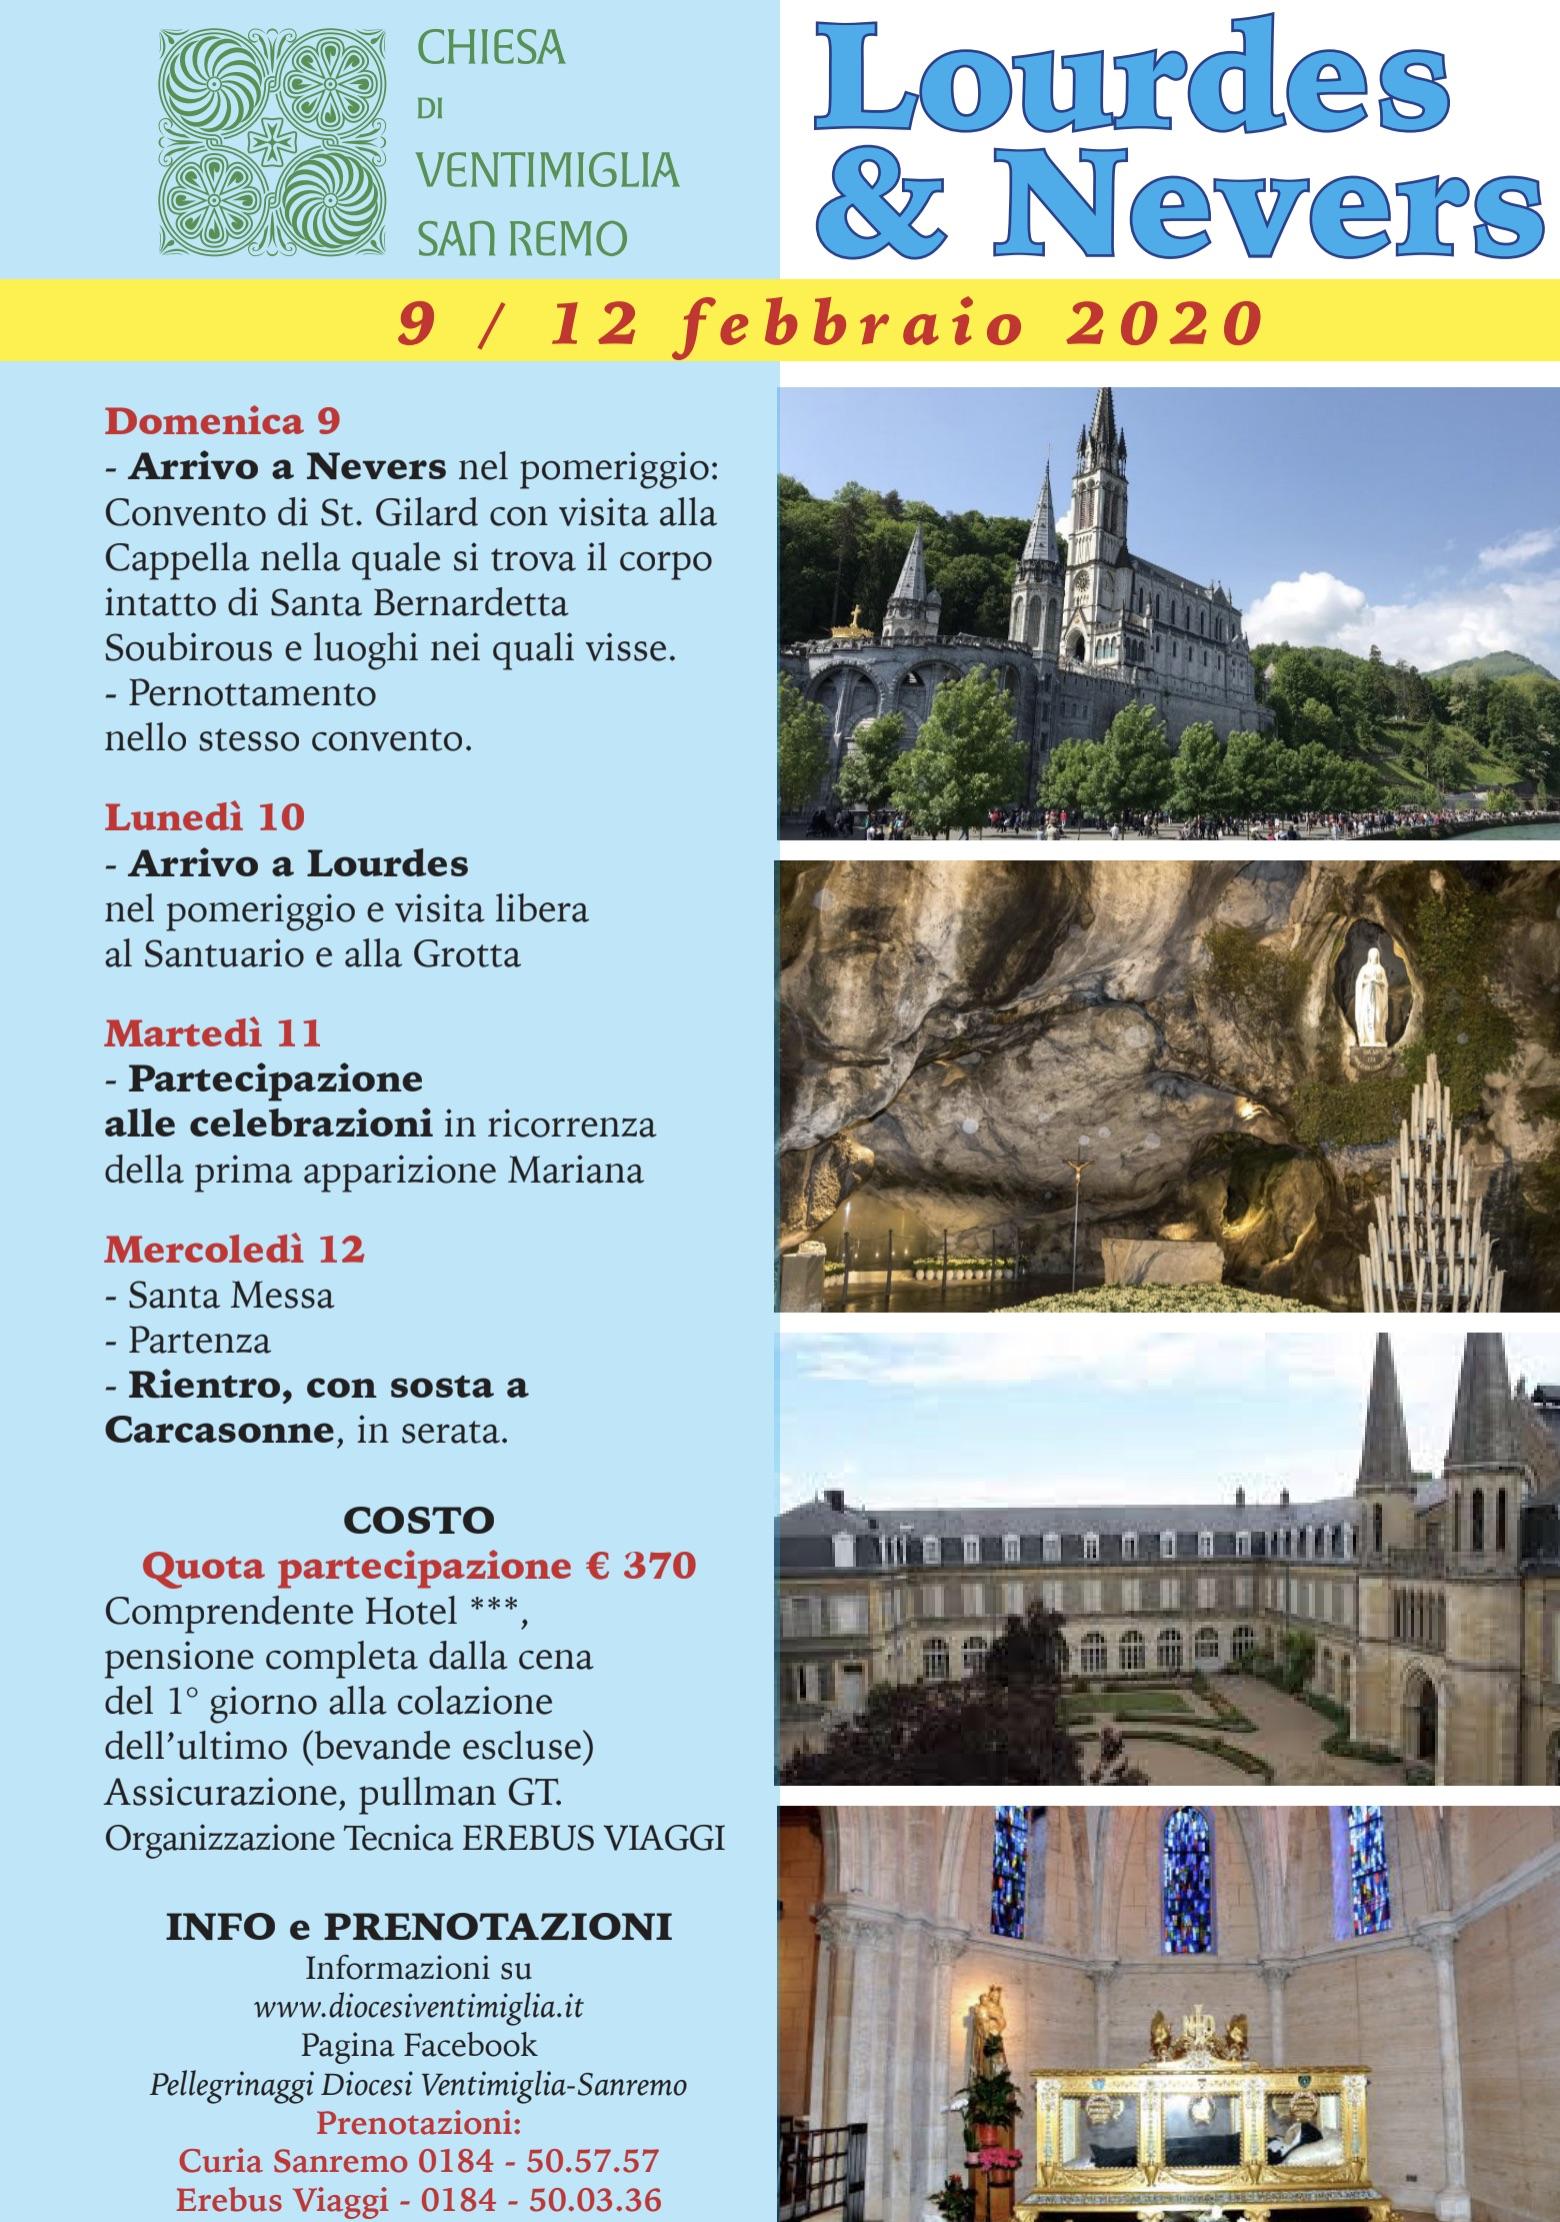 Lourdes e Nevers